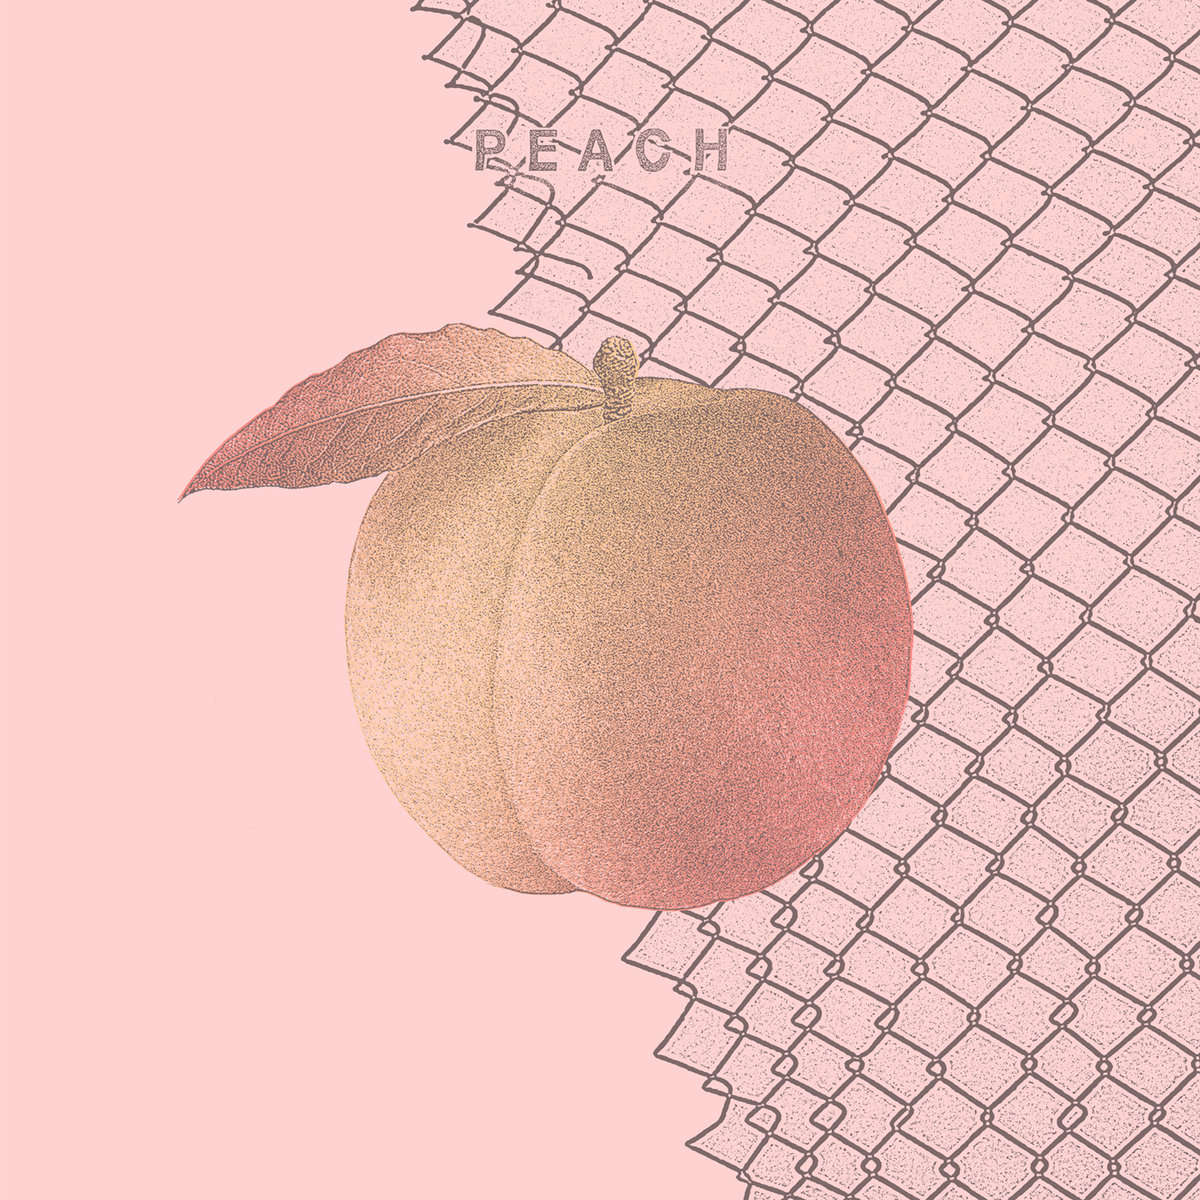 Culture Abuse - Peach LP